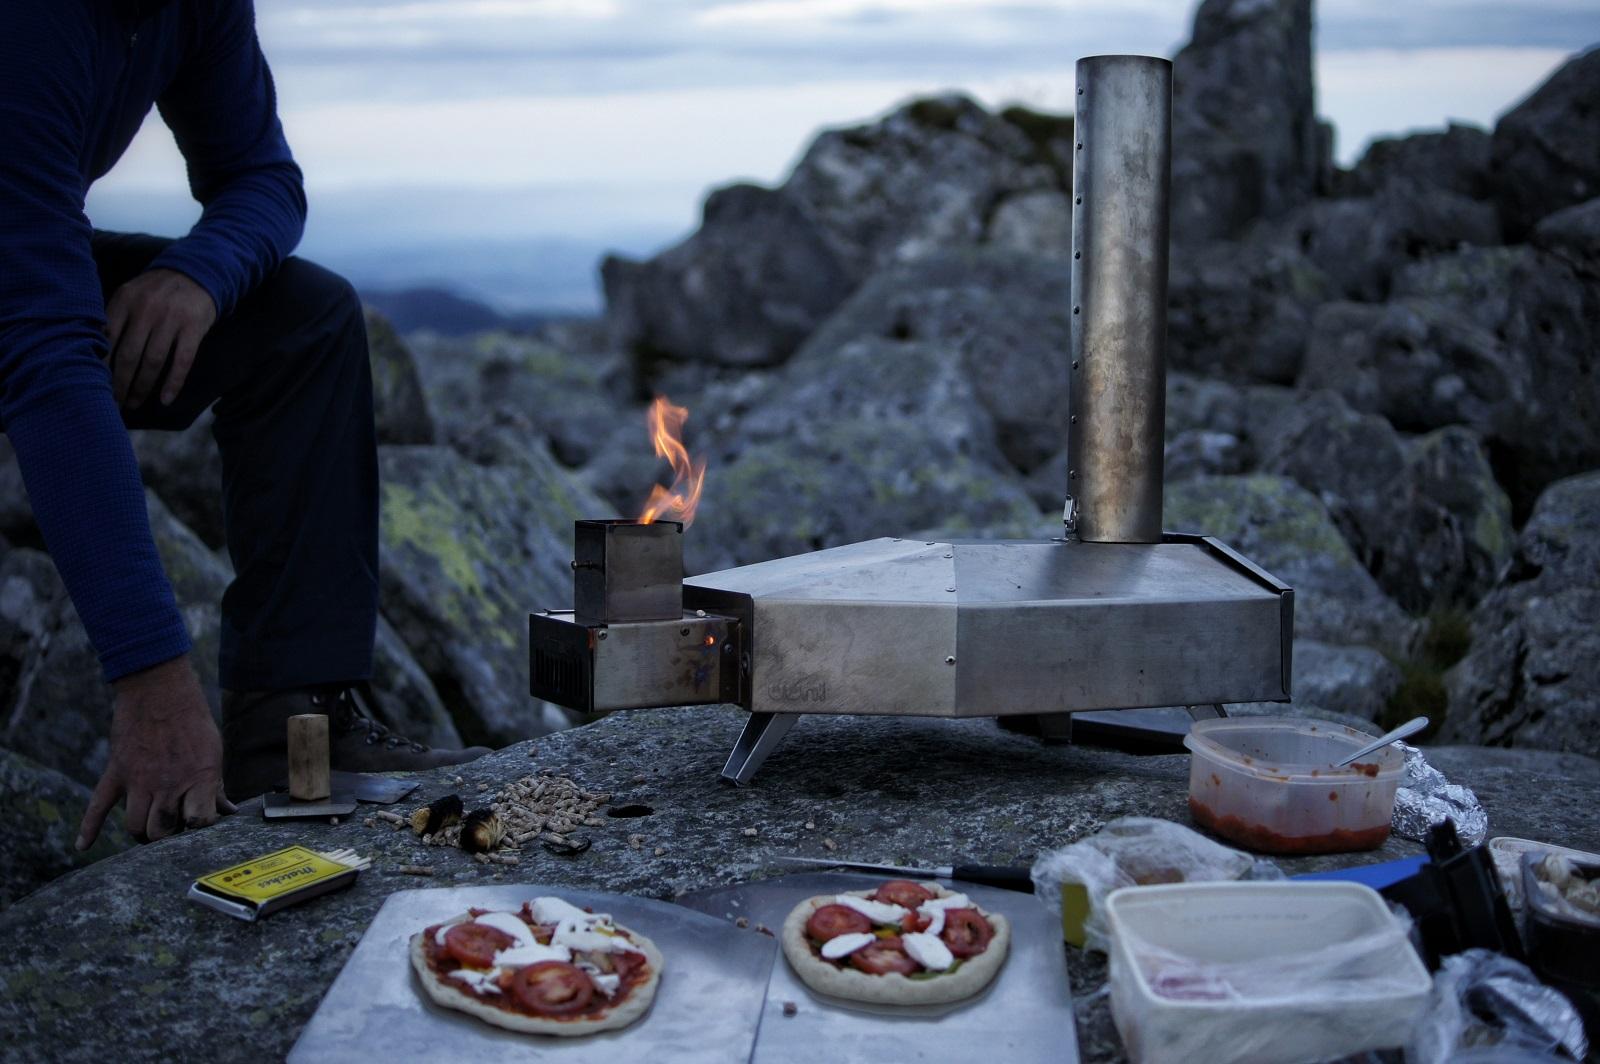 Kieran Rae Wales Tryfan Glyderau Glyder Snowdonia Pizza Oven